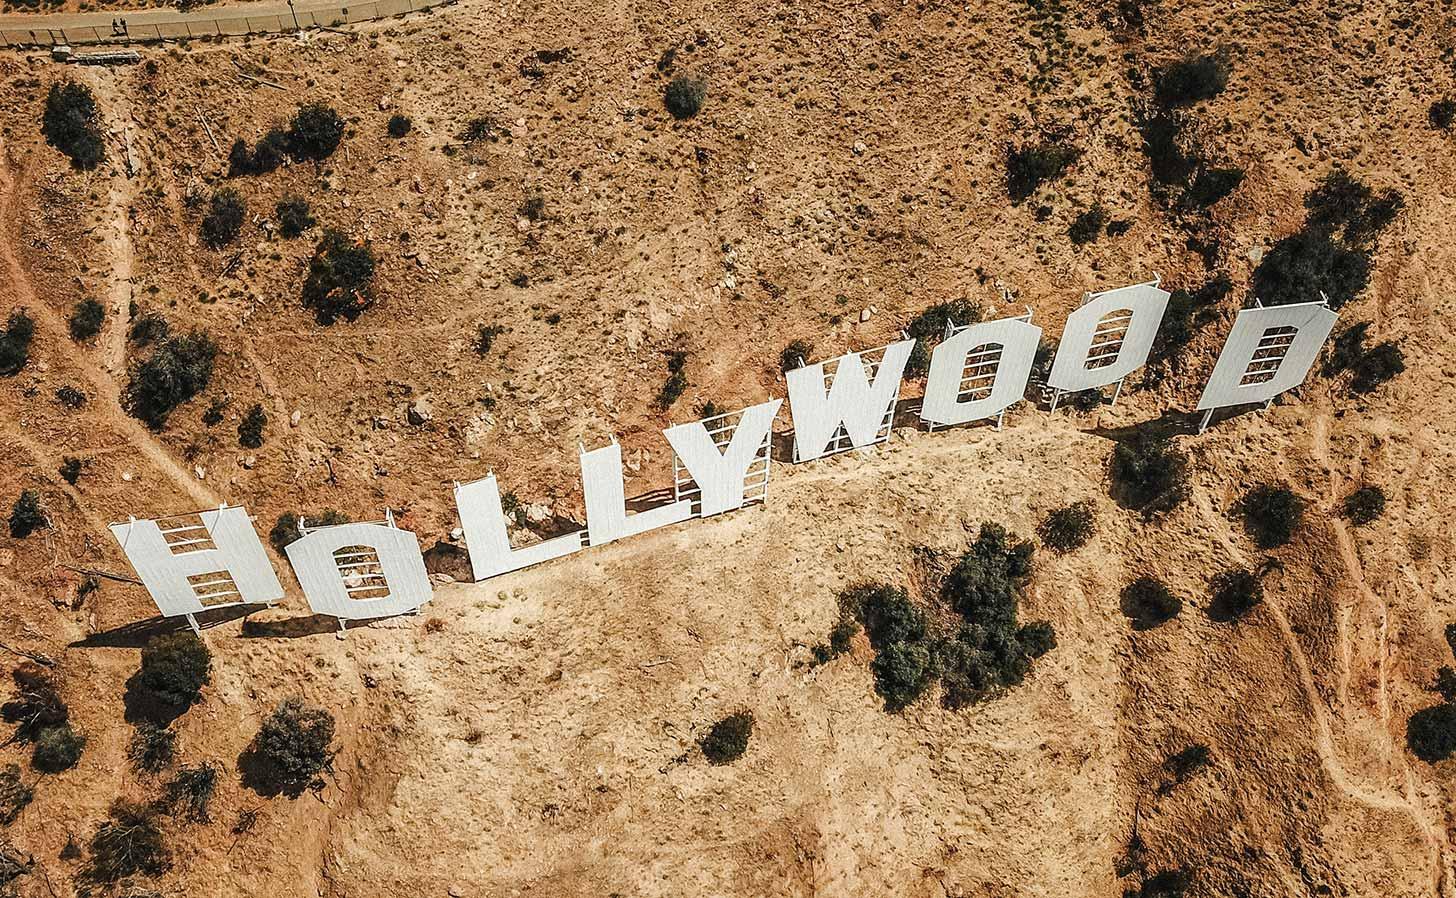 Hollywood-skylten i Los Angeles. Foto: Justin Aikin / Unsplash